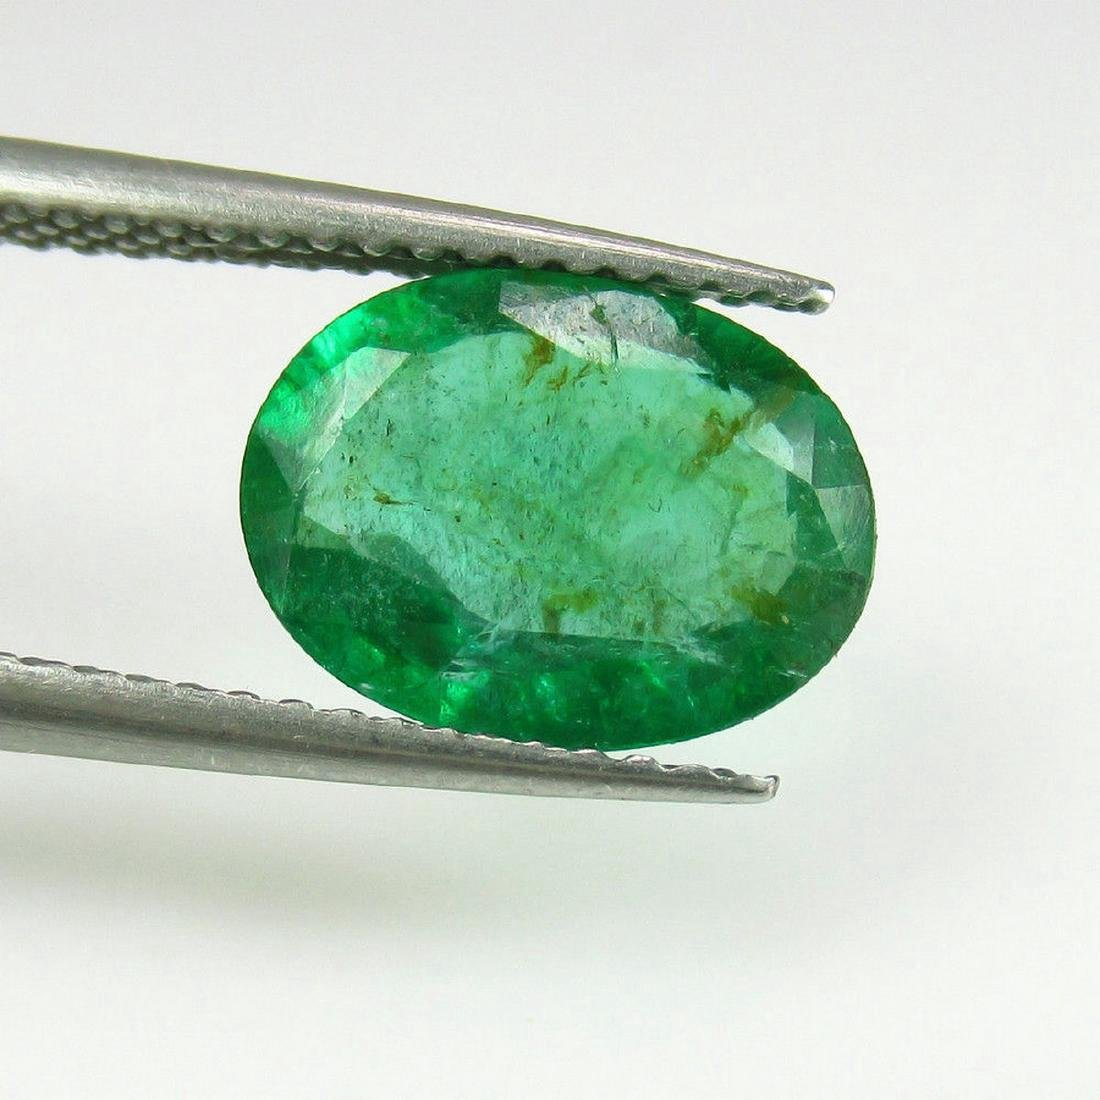 2.24 Carat Loose Zambian Emerald Oval